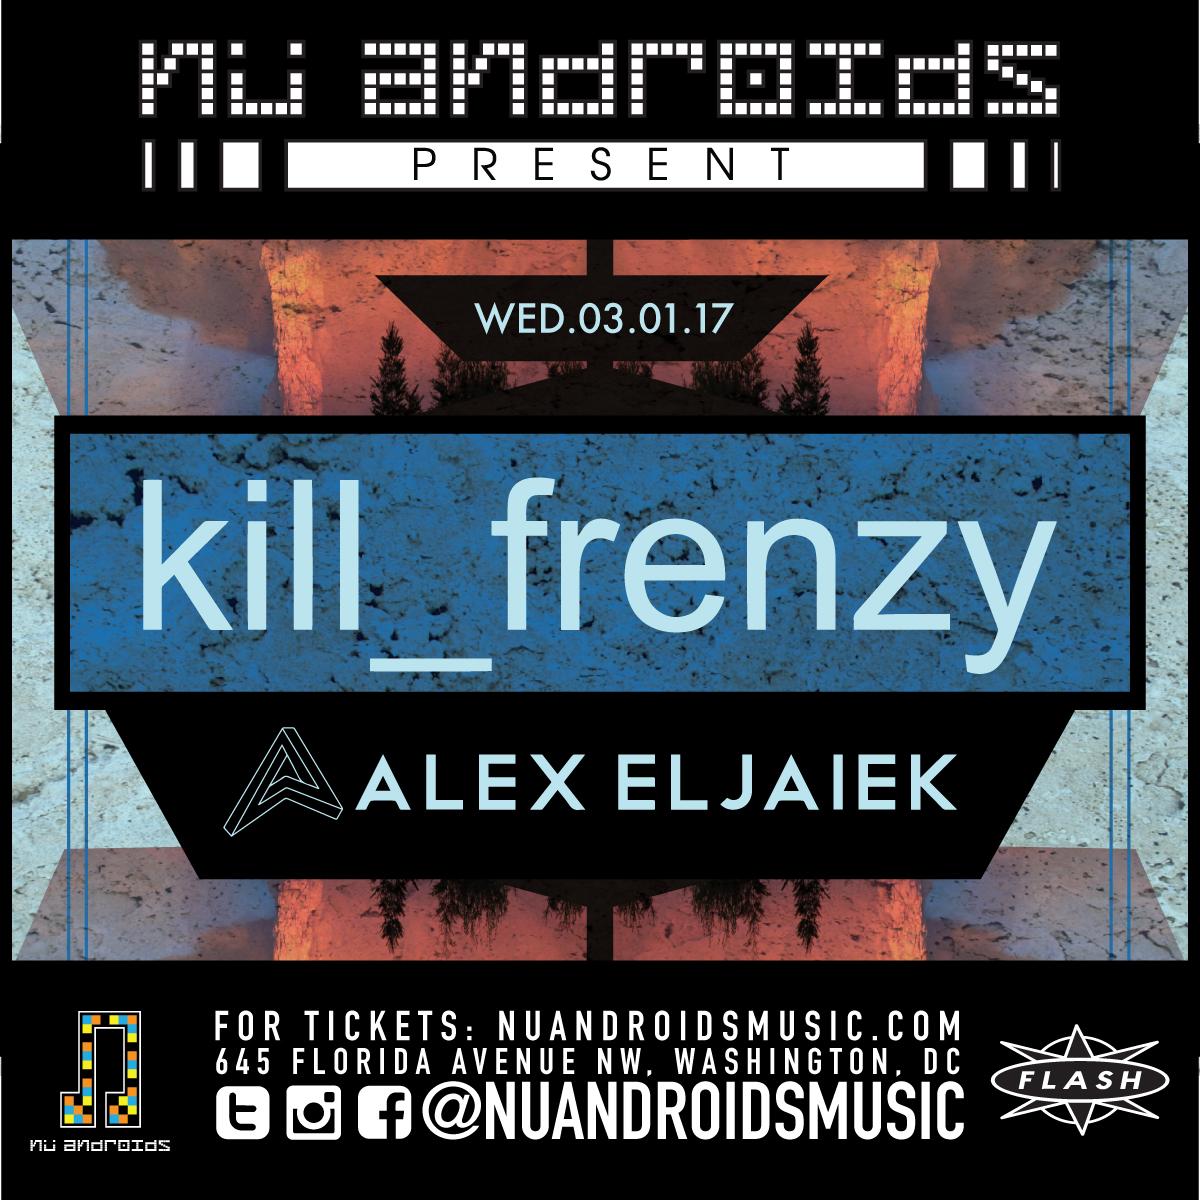 Kill Frenzy event thumbnail